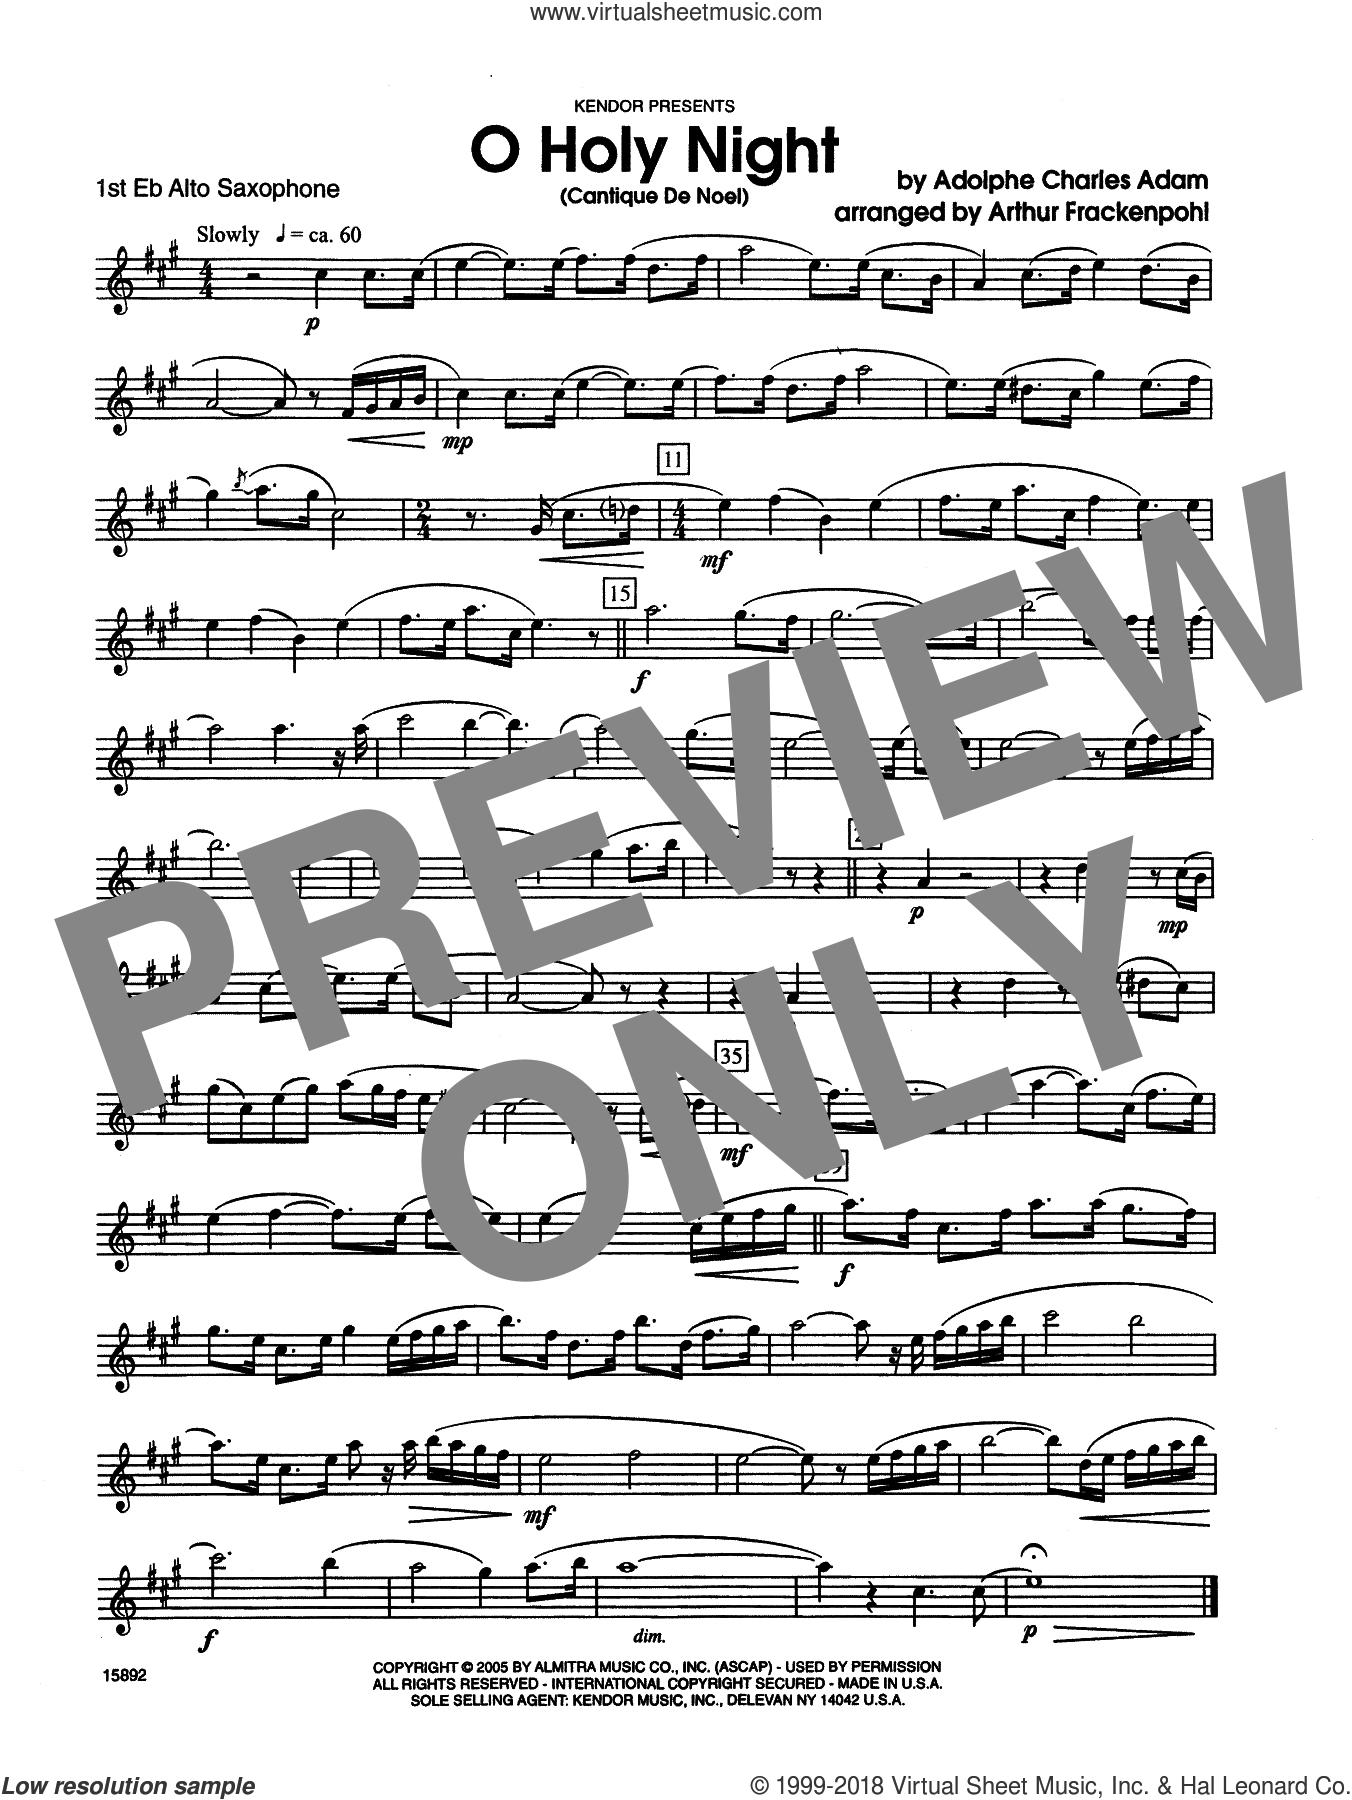 O Holy Night (Cantique de Noel) sheet music for saxophone trio (1st Eb alto saxophone) by Arthur Frackenpohl, Adolphe Adam and Adam, intermediate skill level